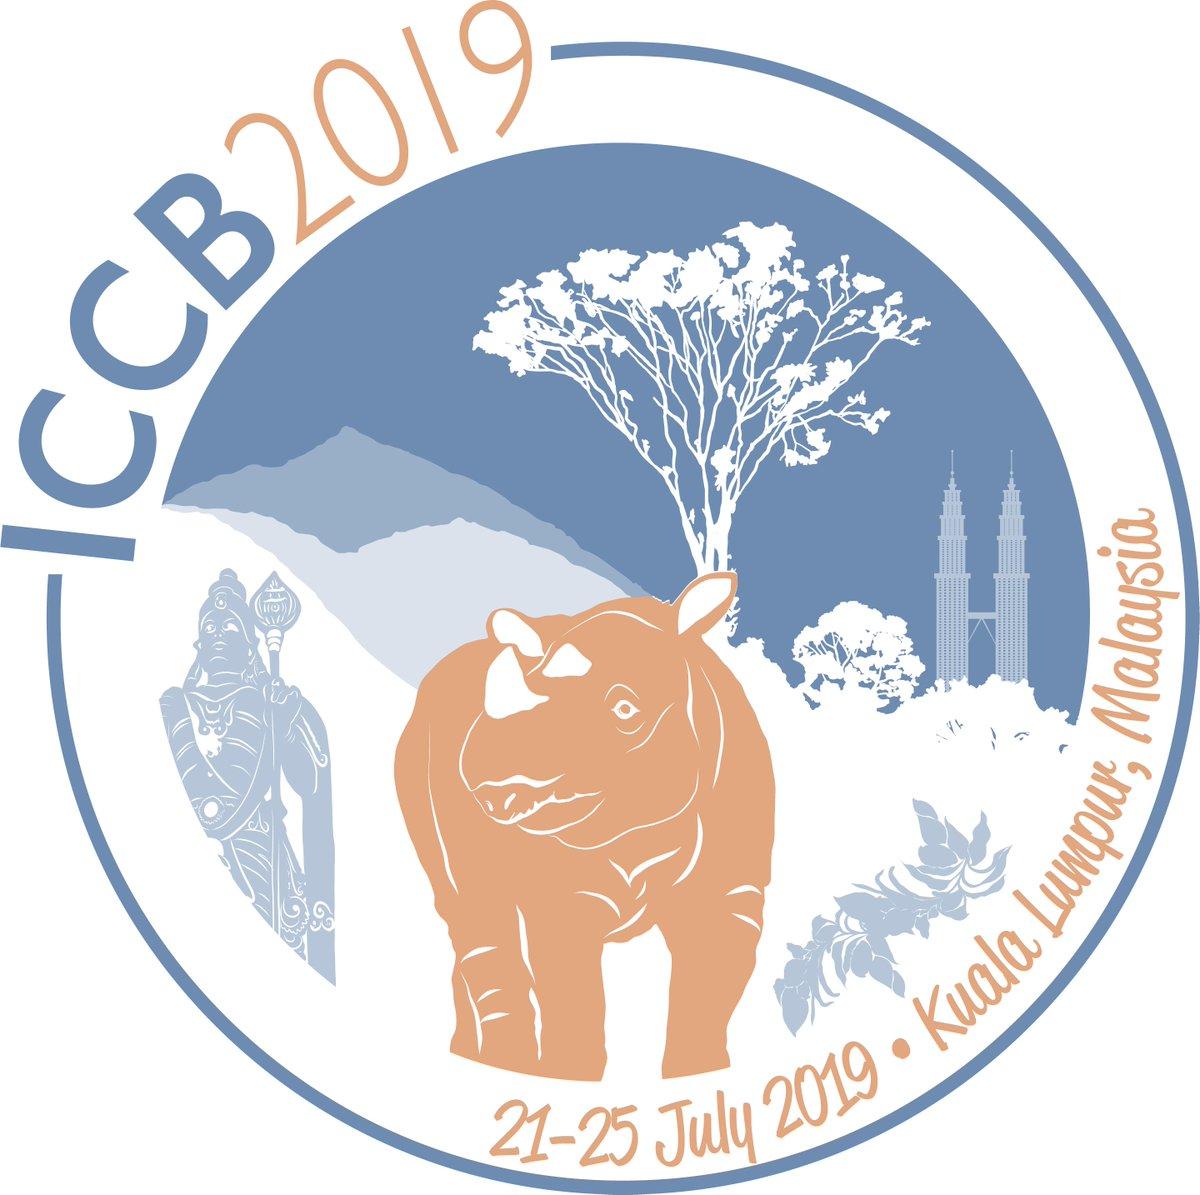 ICCB 2019 on Twitter: